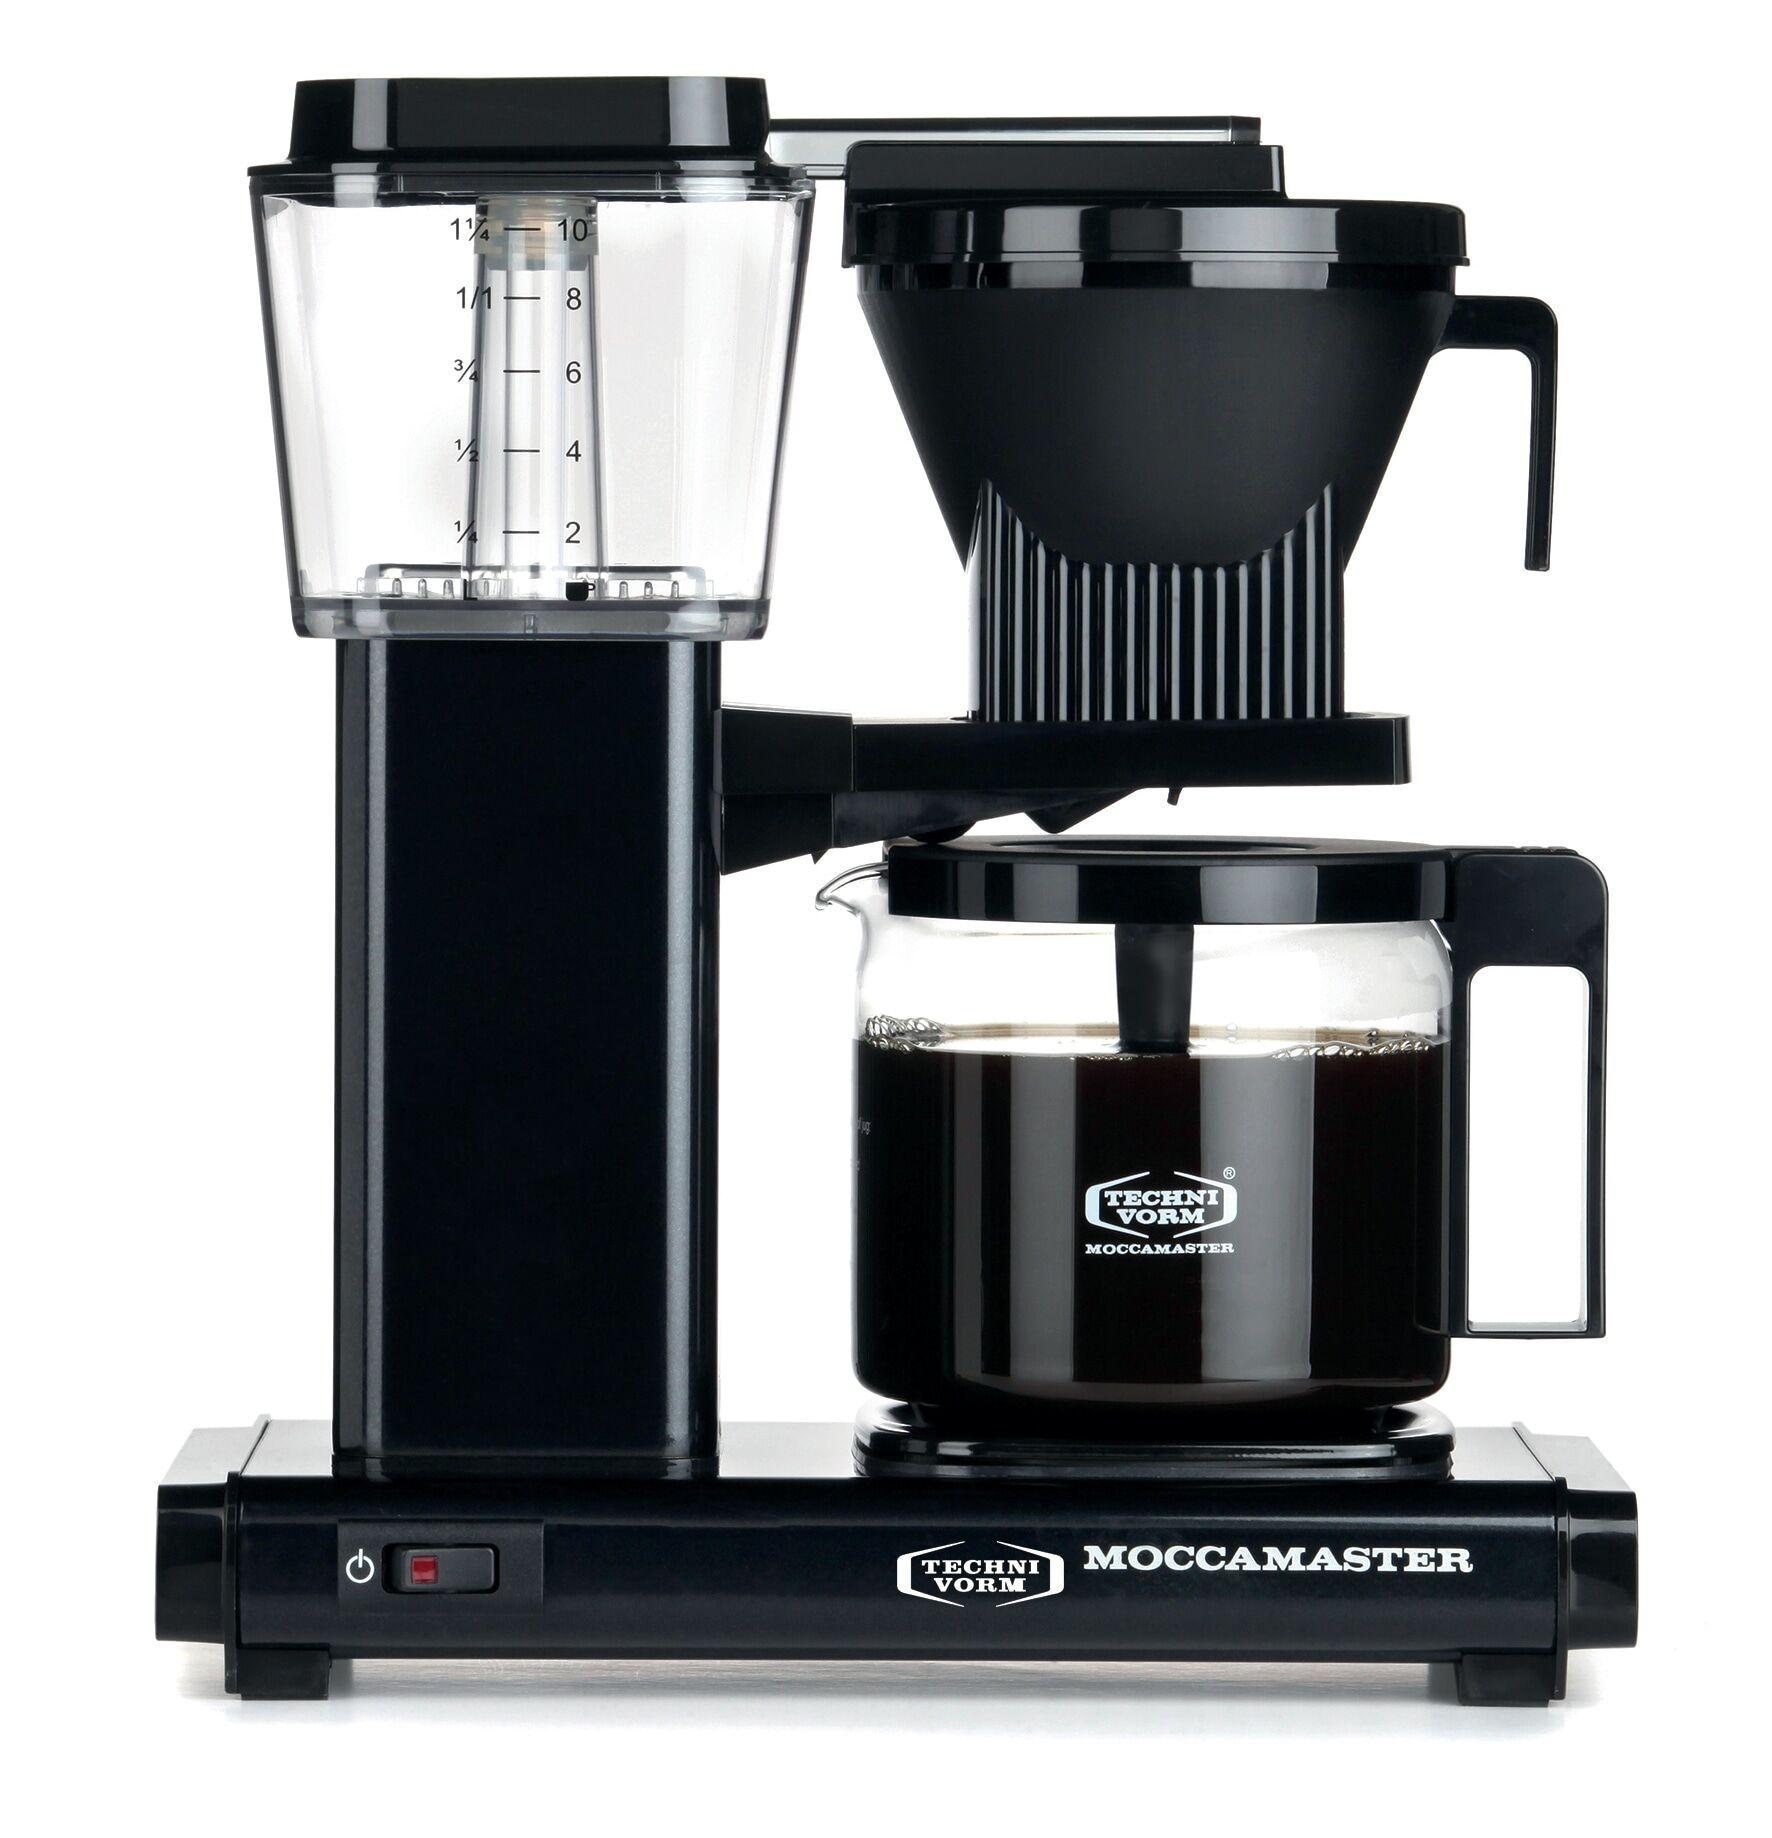 Moccamaster HBG961 AO kahvinkeitin